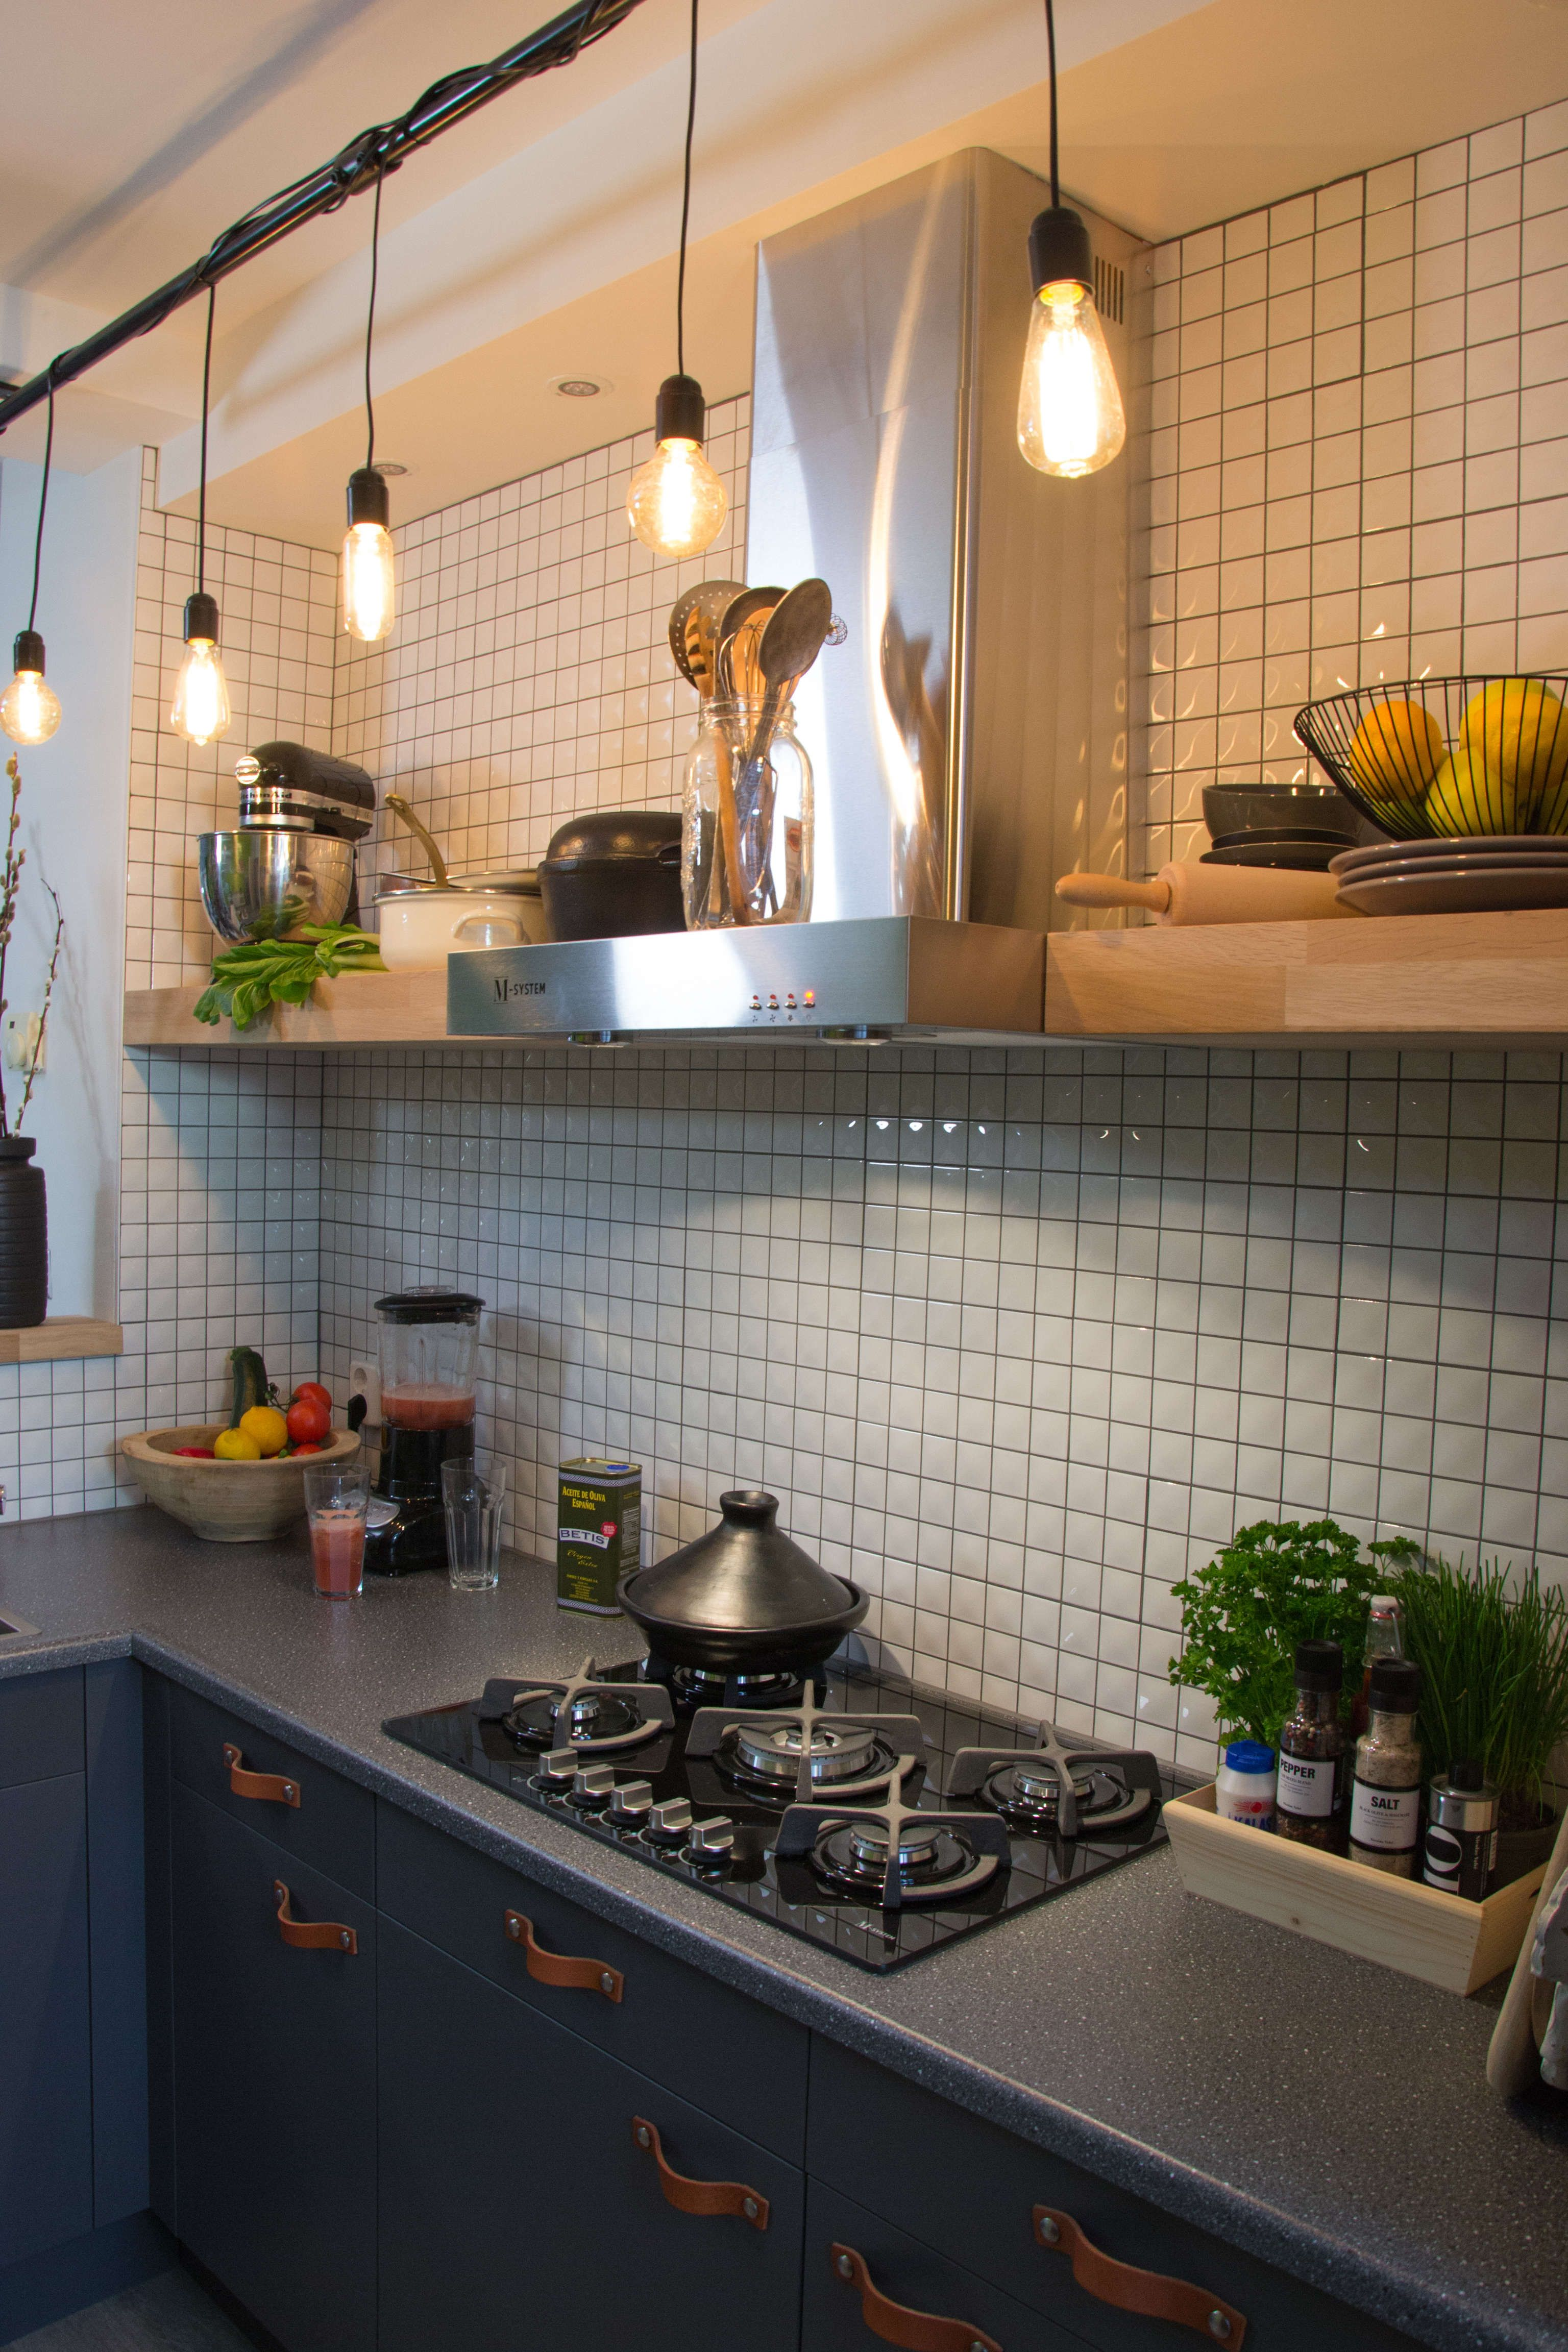 Hanglamp Boven Keuken – Atumre.com